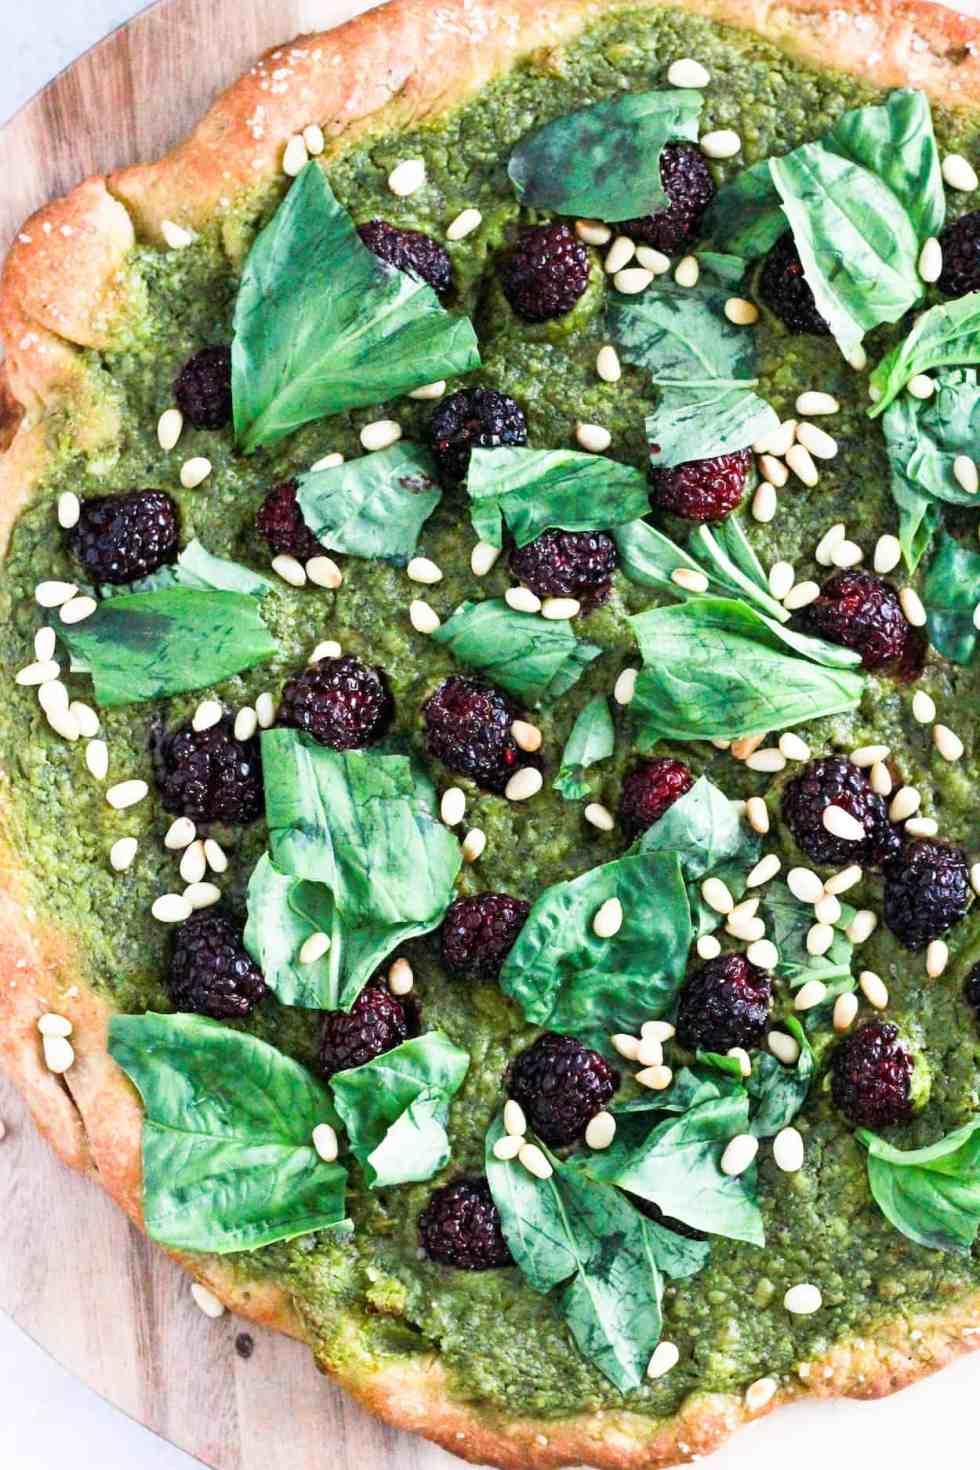 Green vegan pesto pizza on wood board.